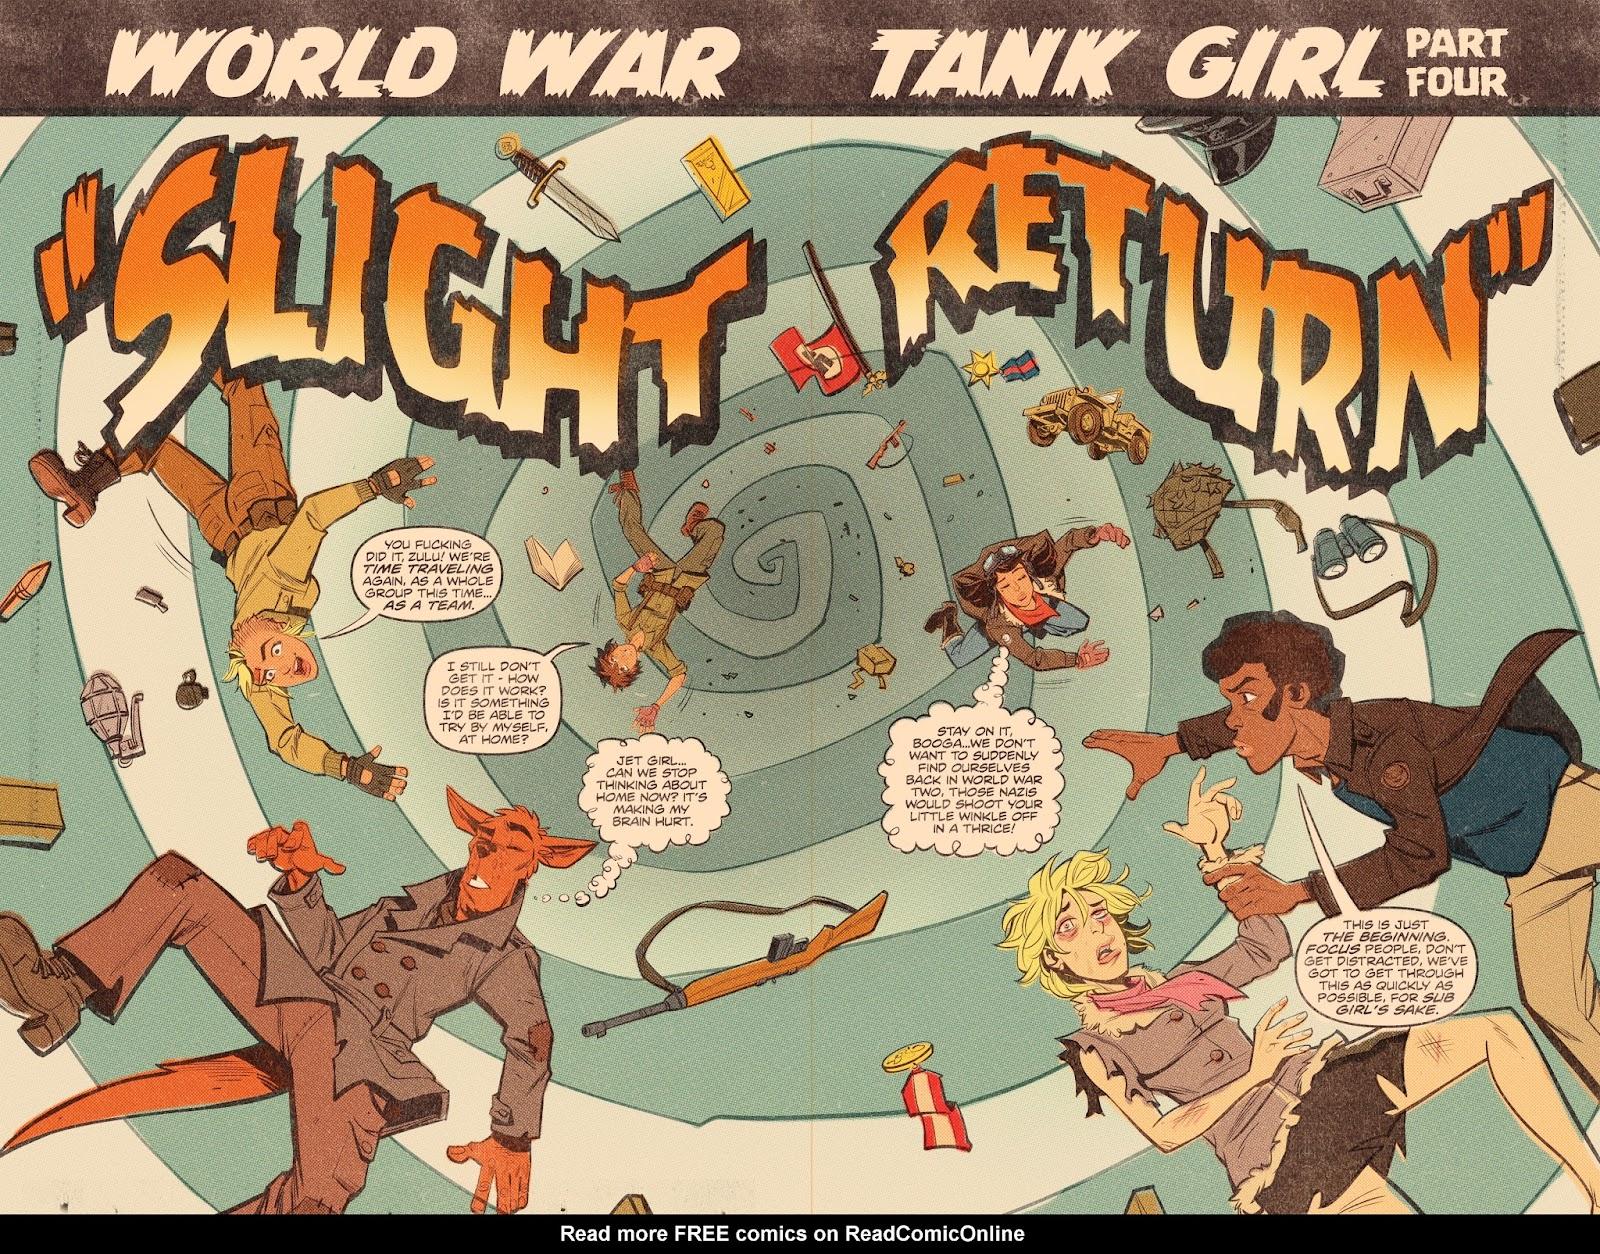 Read online Tank Girl: World War Tank Girl comic -  Issue #4 - 6